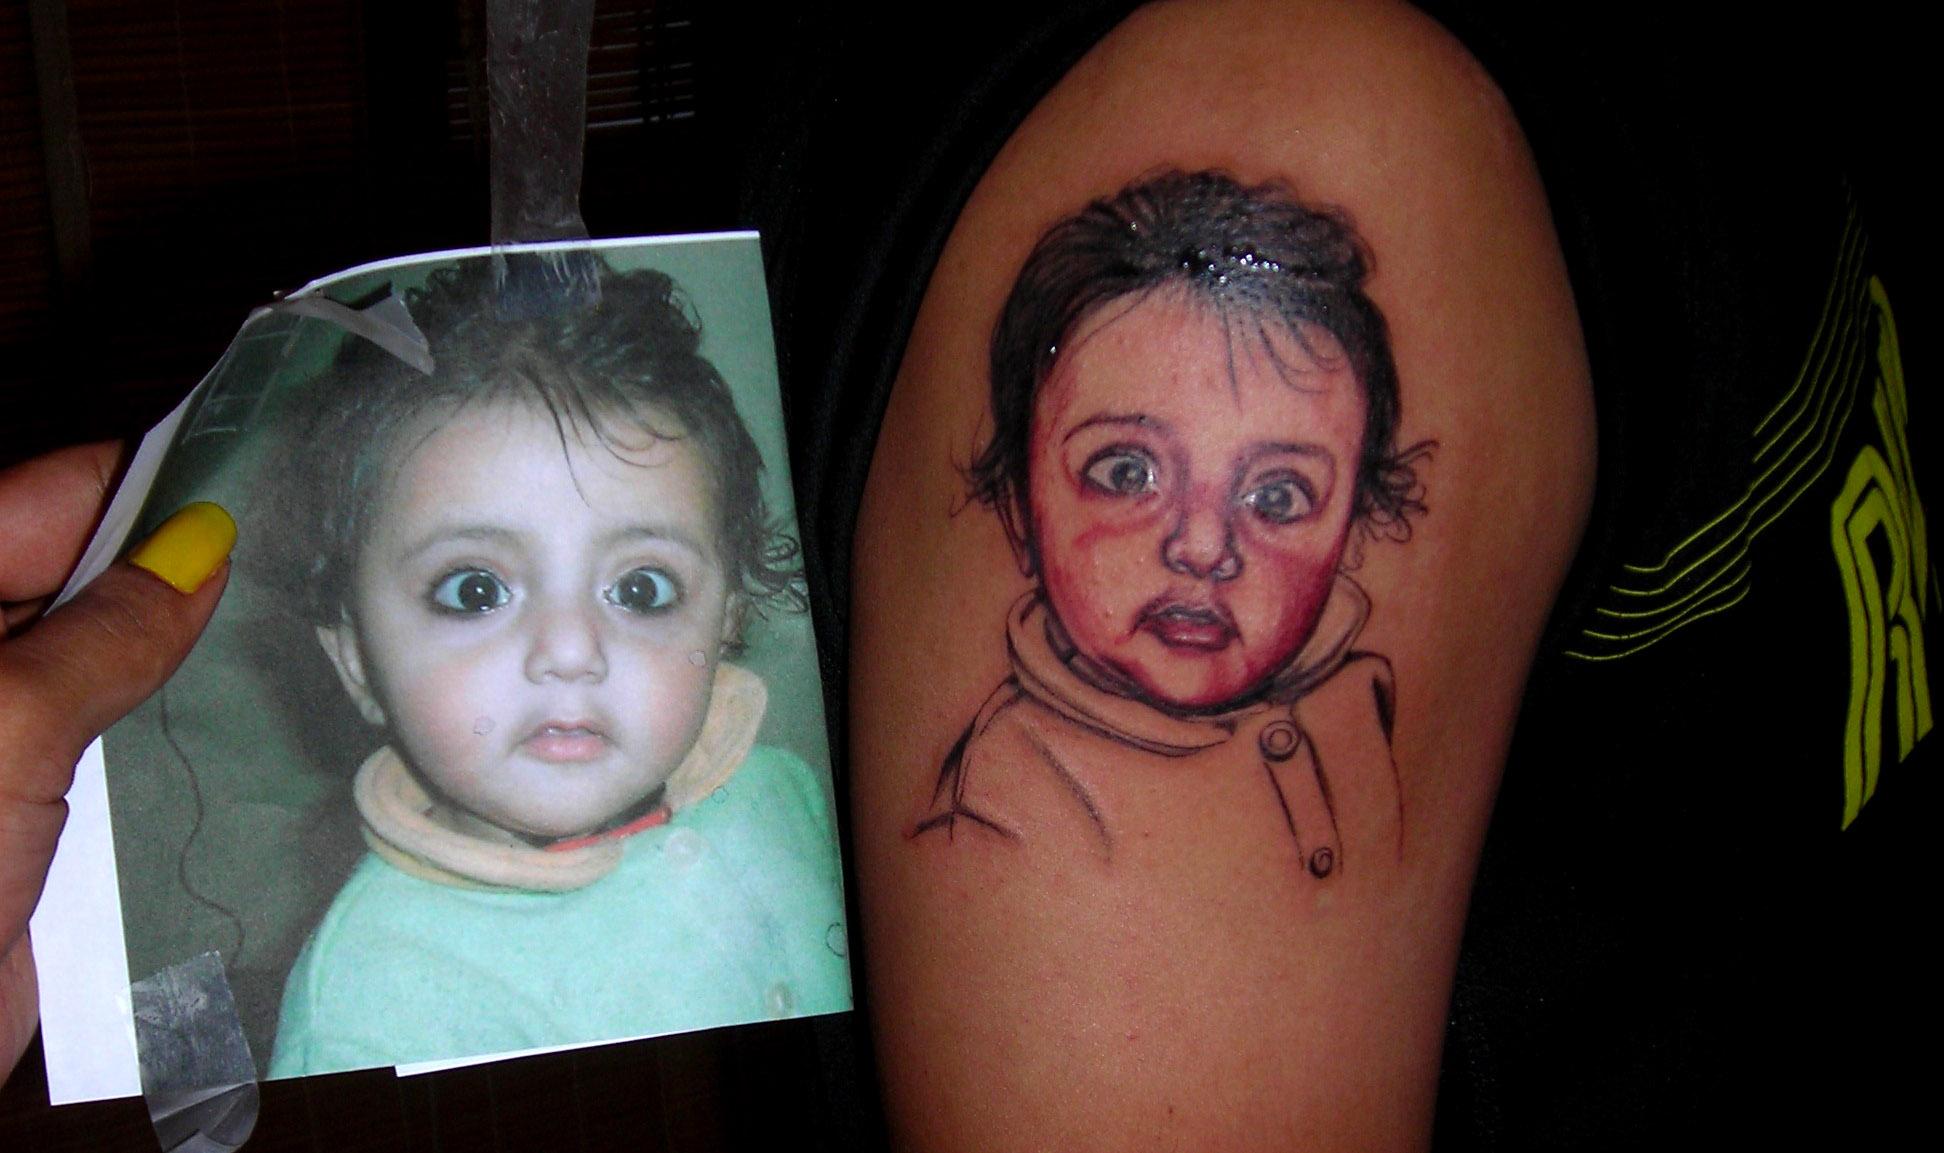 Baby portrait tattoo ideas - Baby Portrait Tattoo On Shoulder